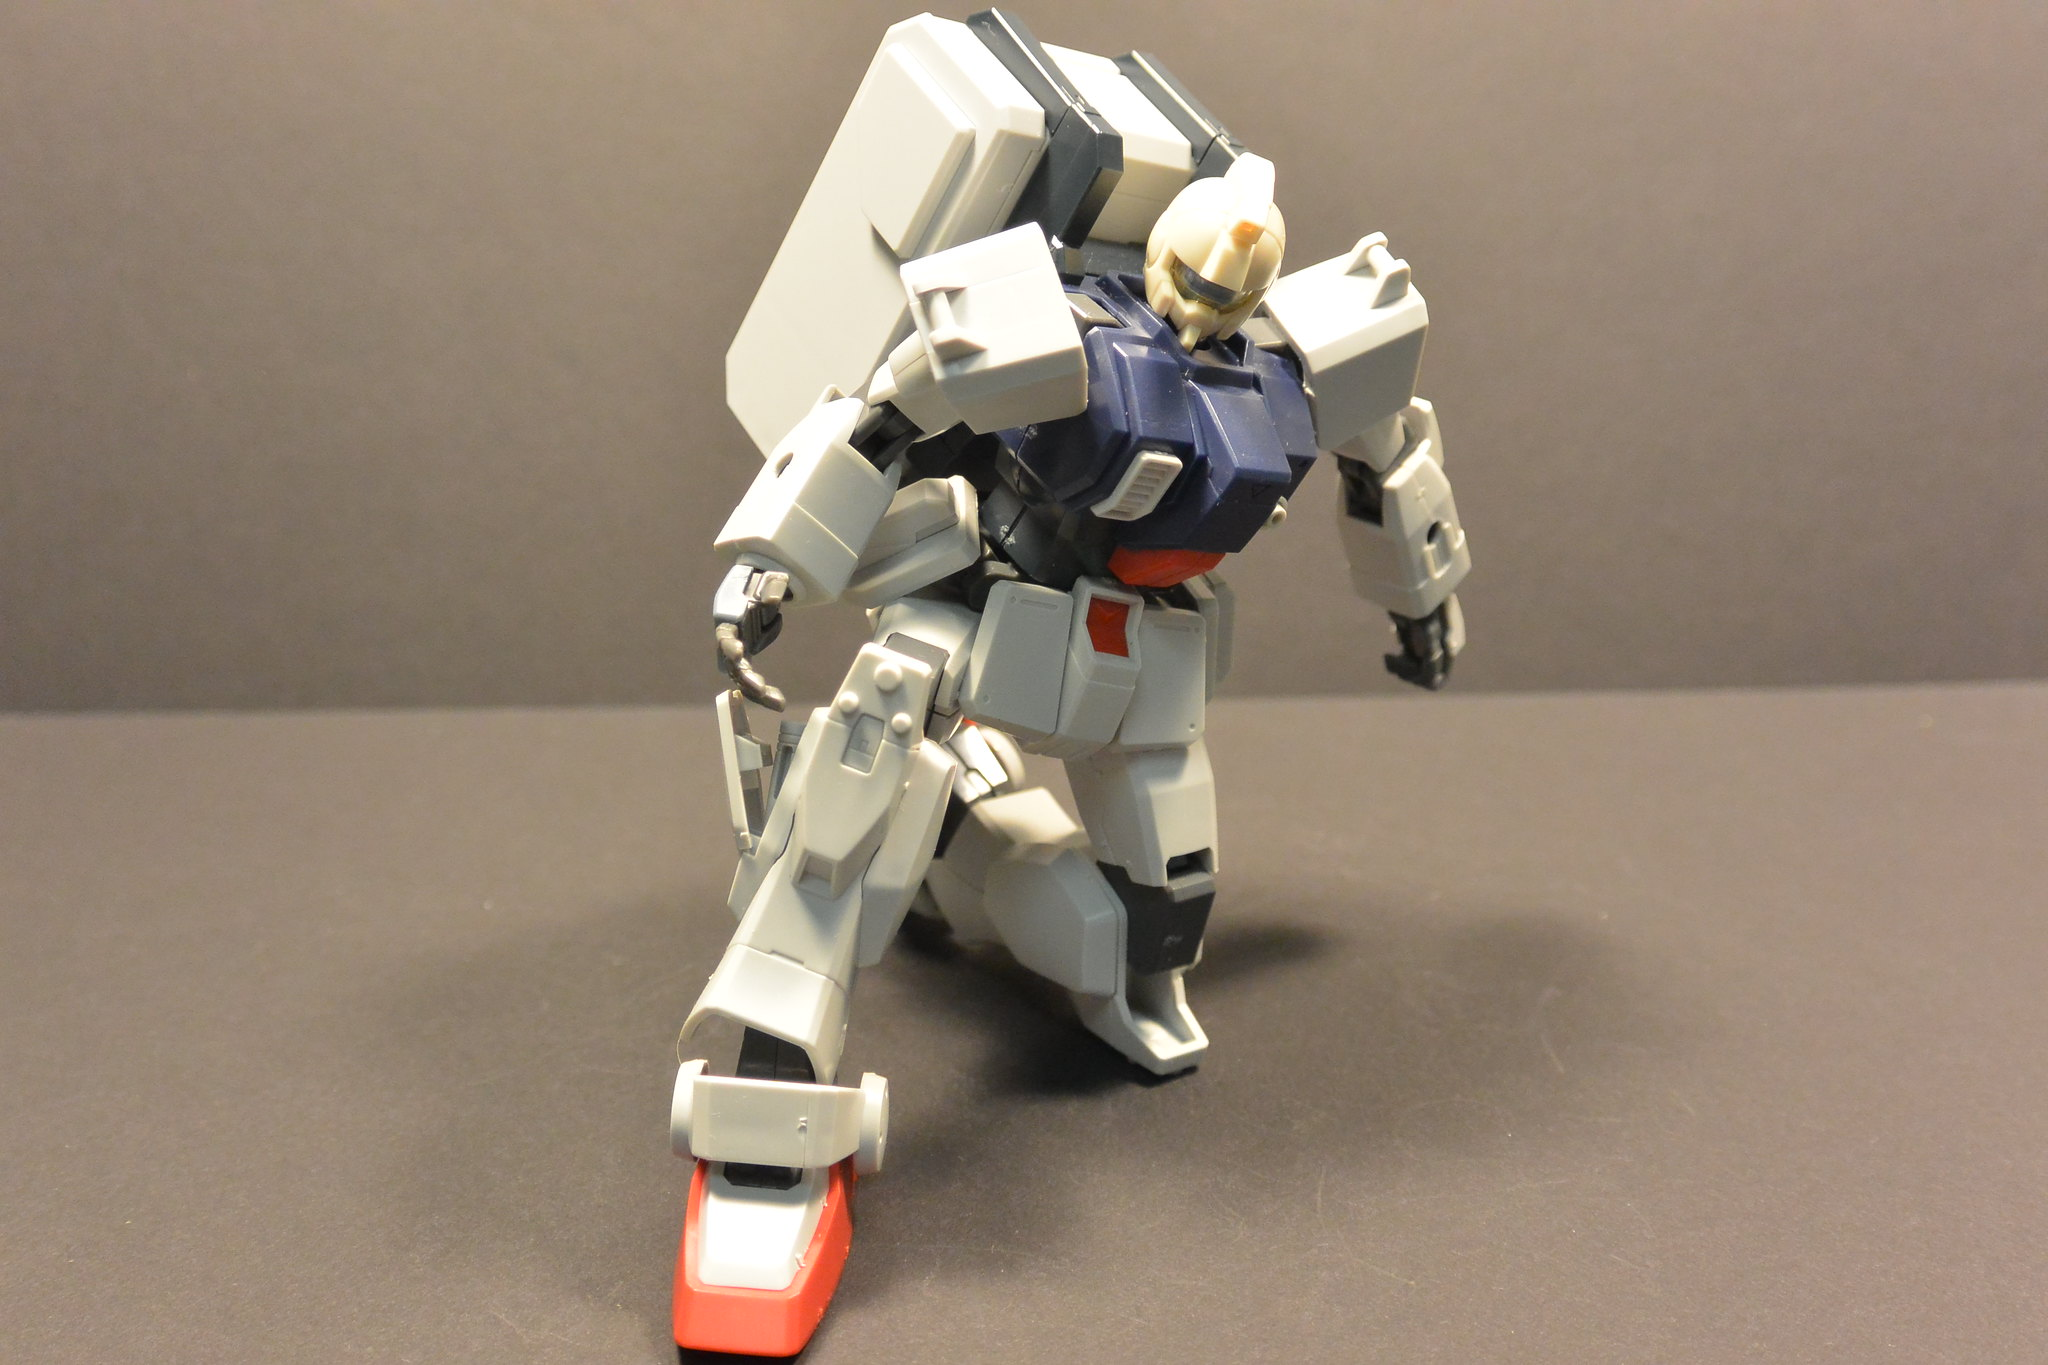 Gundam For The Barrel: [Review] HG U.C. HARDGRAPH 1/144 GUNDAM THE GROUND WAR SET